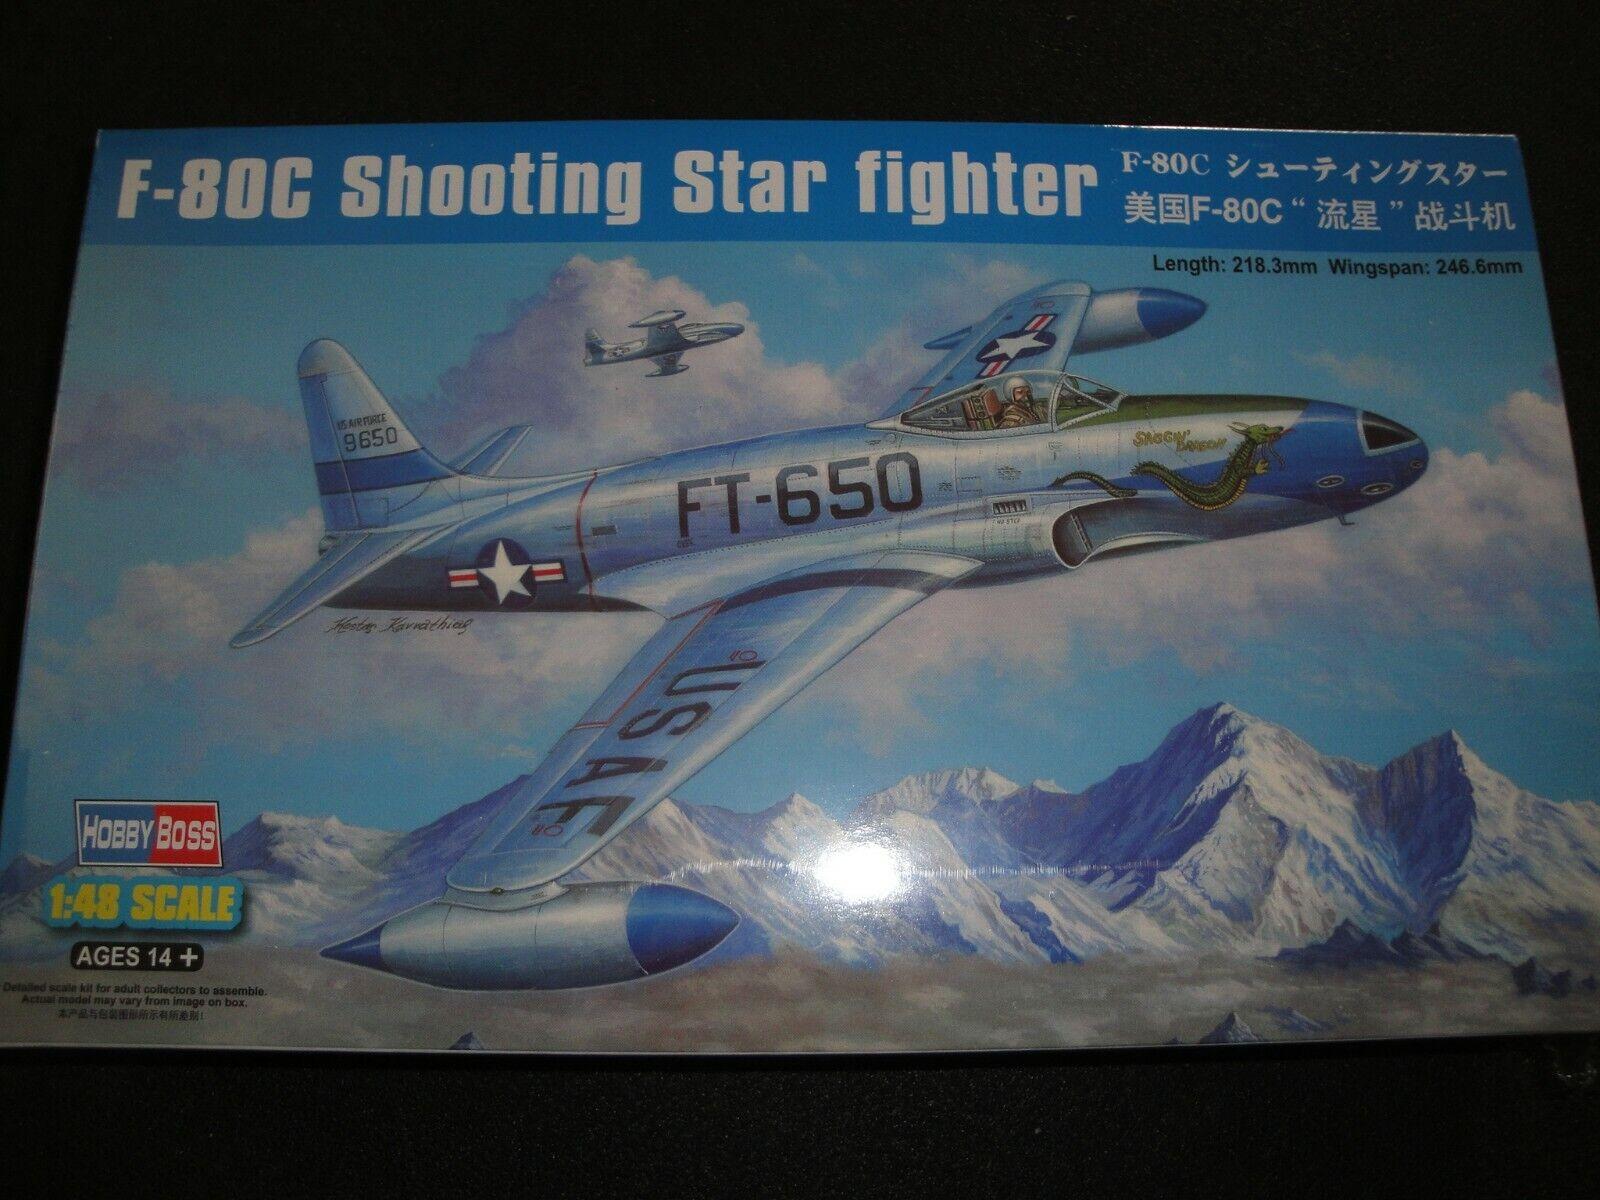 HOBBY BOSS 1 48 F-80C  Shooting Star  81725 New